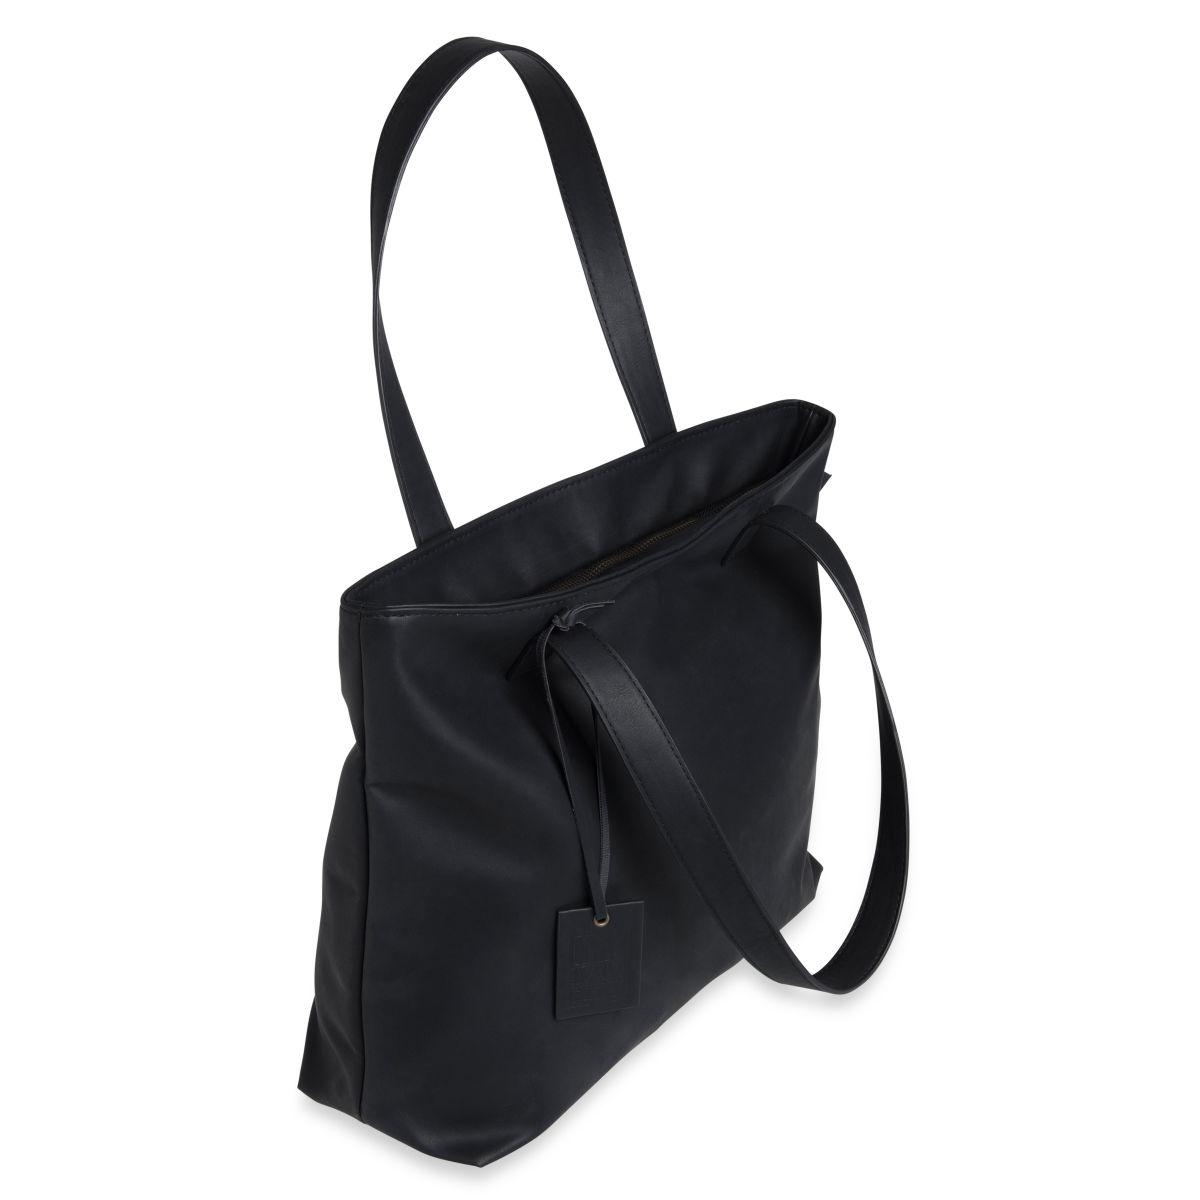 sofia handbag black